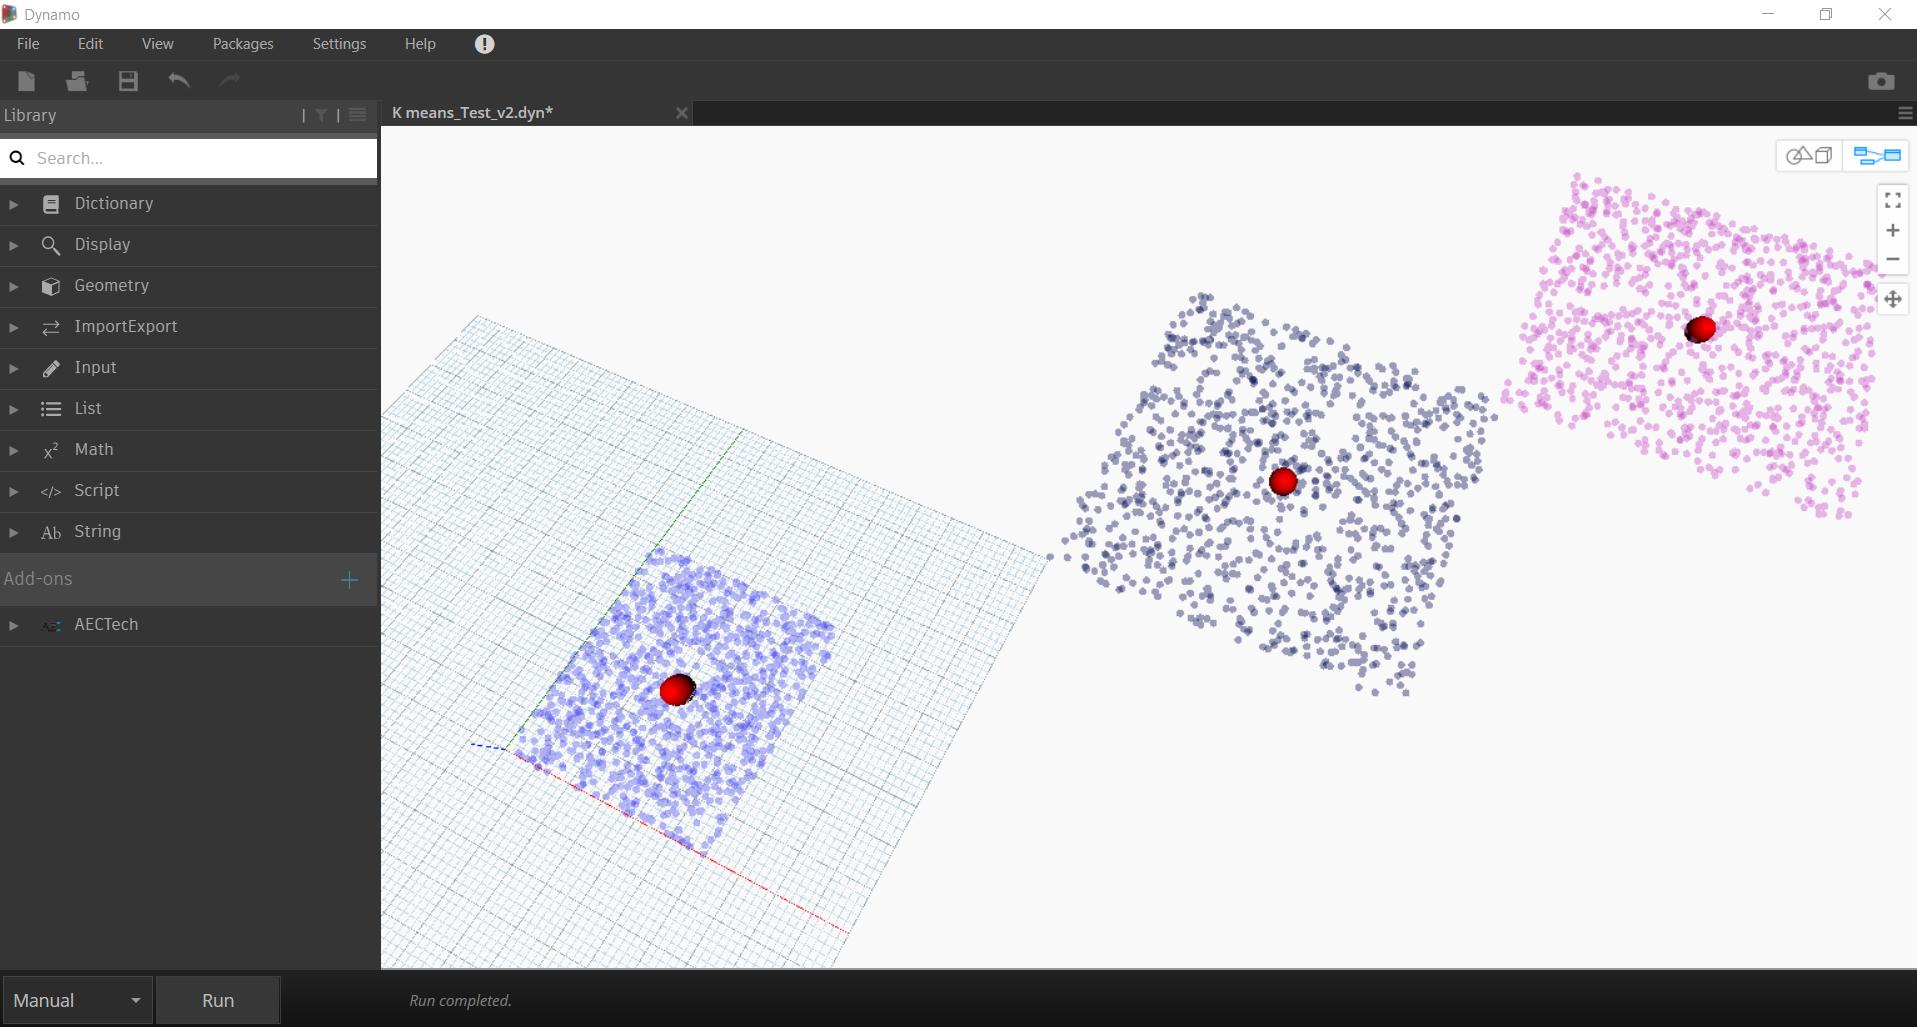 K-Means Clustering Algorithm in Dynamo